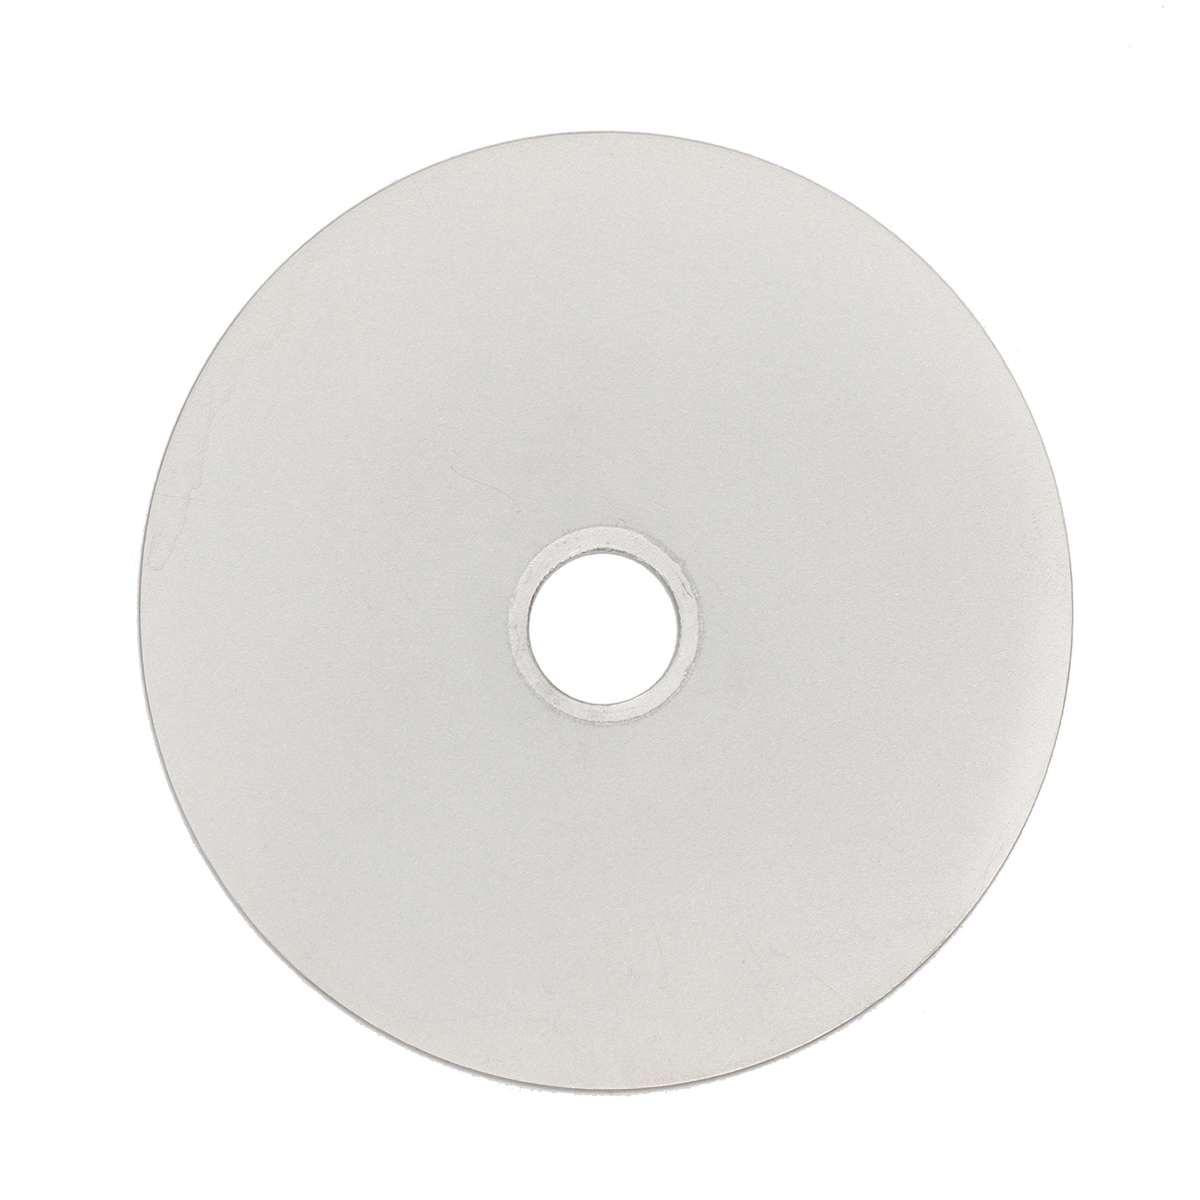 3000 Grit Diamond Coated Flat Lap Wheel Polishing Grinding Disc Grinding Wheel Rotary Tool Diamond Discs Accessories 4 Inch